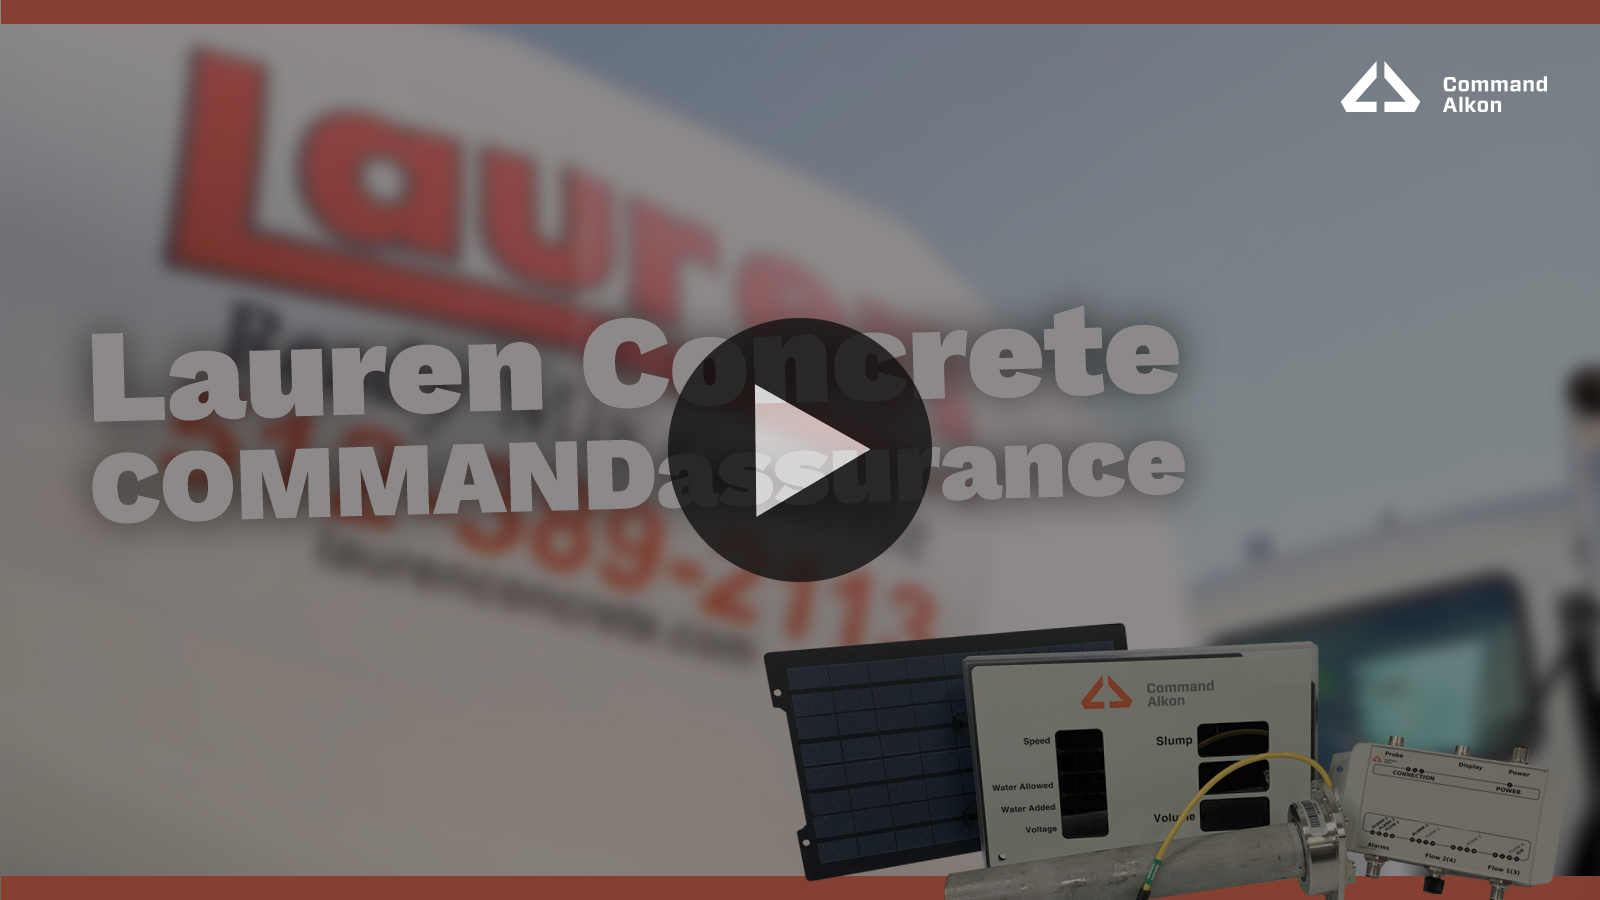 See Command Alkon COMMANDassurance Video